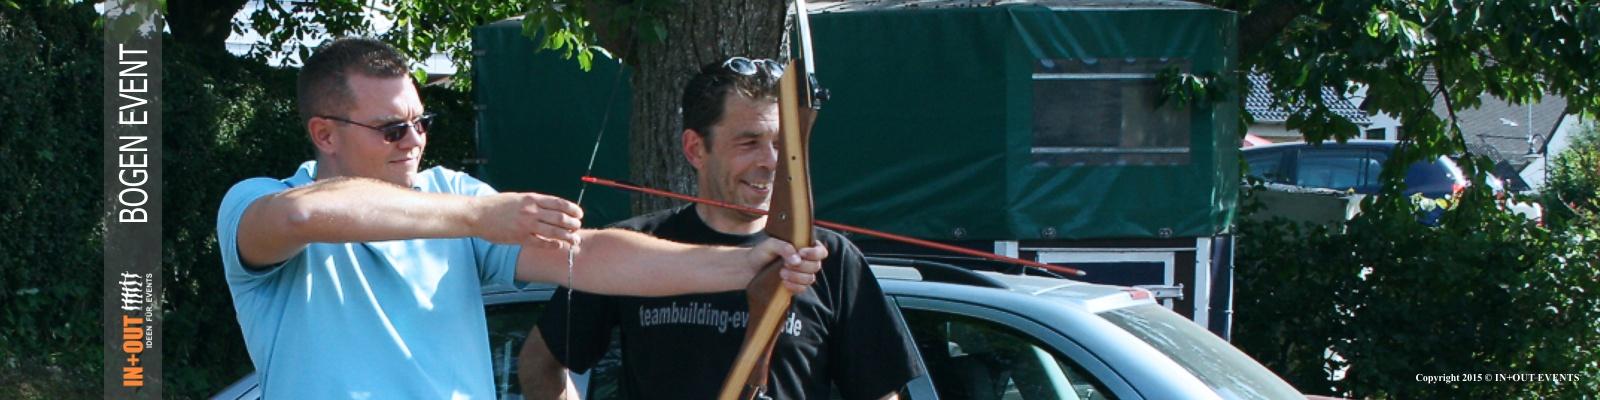 Bogenschießen - IN+OUT TEAM EVENTS